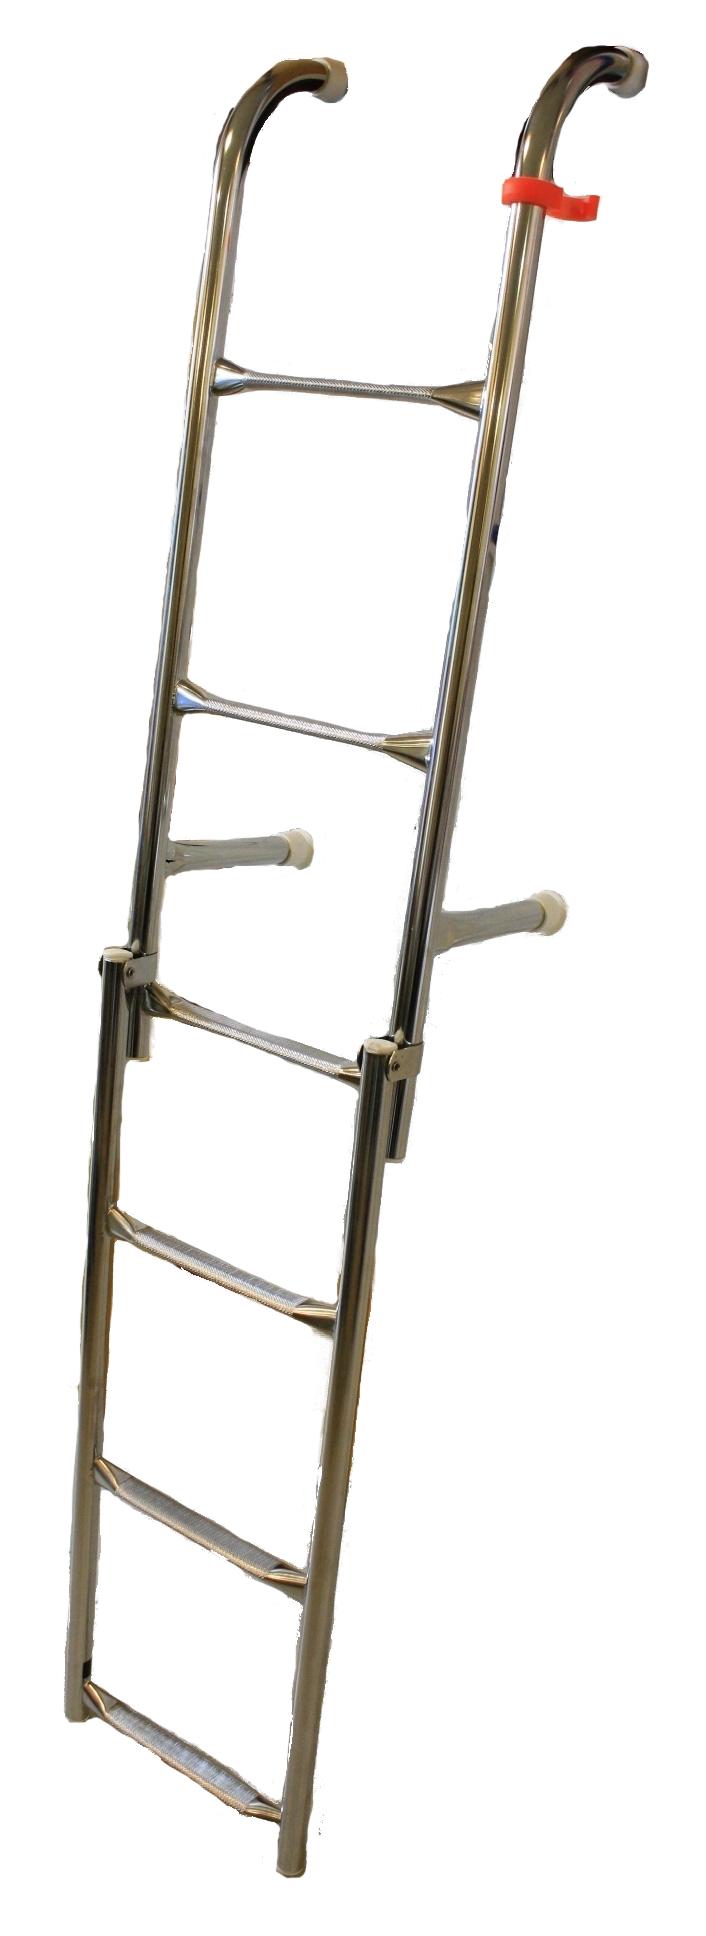 Dixon Stainless Steel Boarding Ladder Tr6